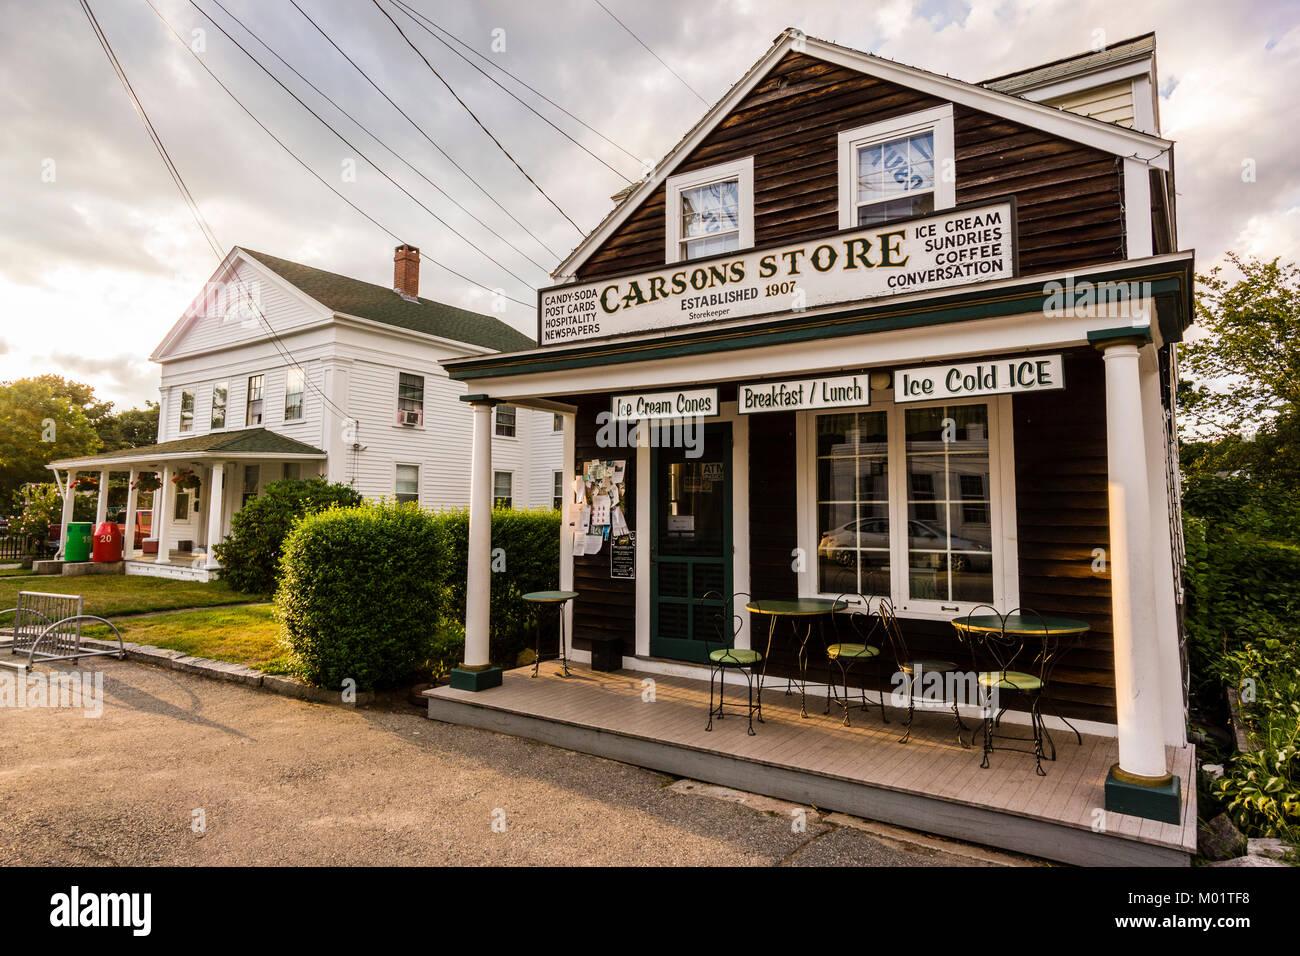 Carson's Store   Noank, Connecticut, USA Stock Photo